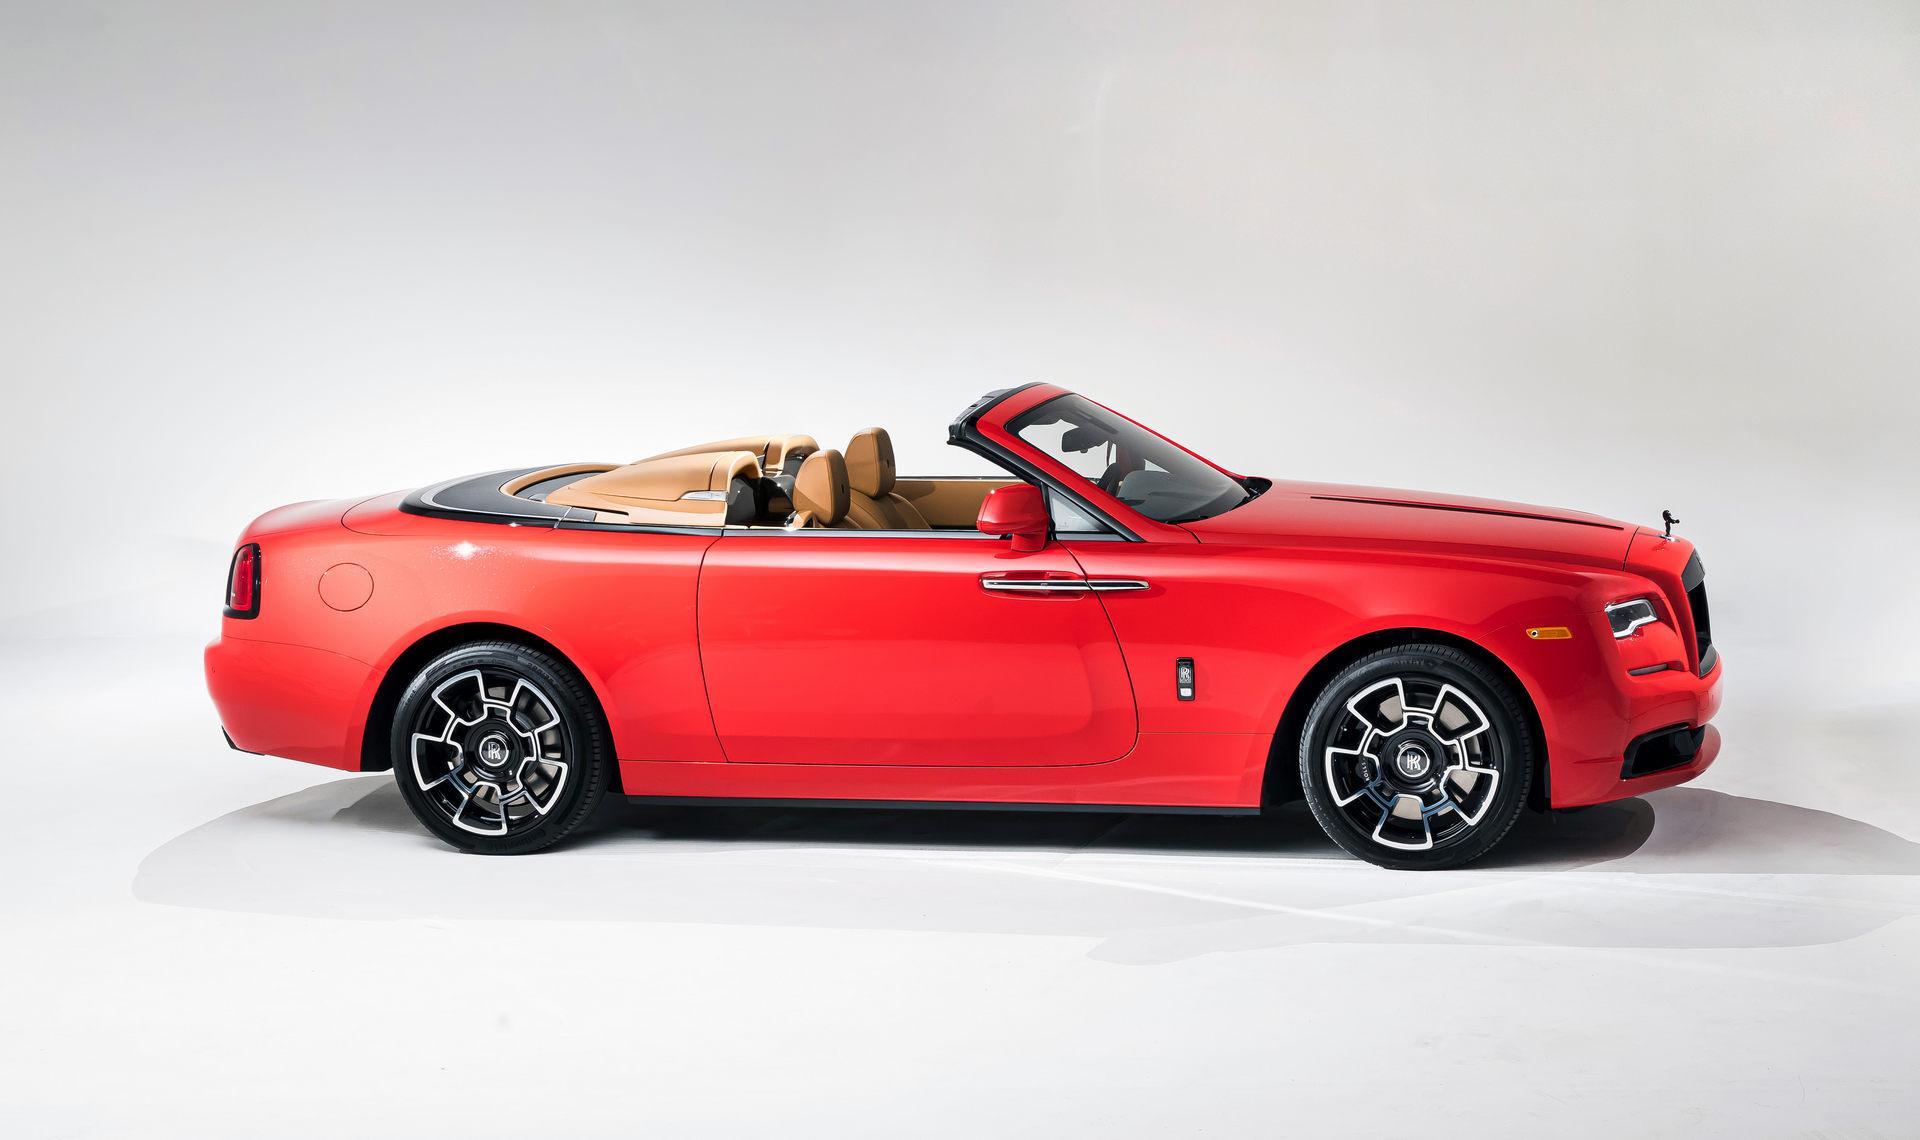 Bespoke-Rolls-Royce-Phantom-and-Dawn-15